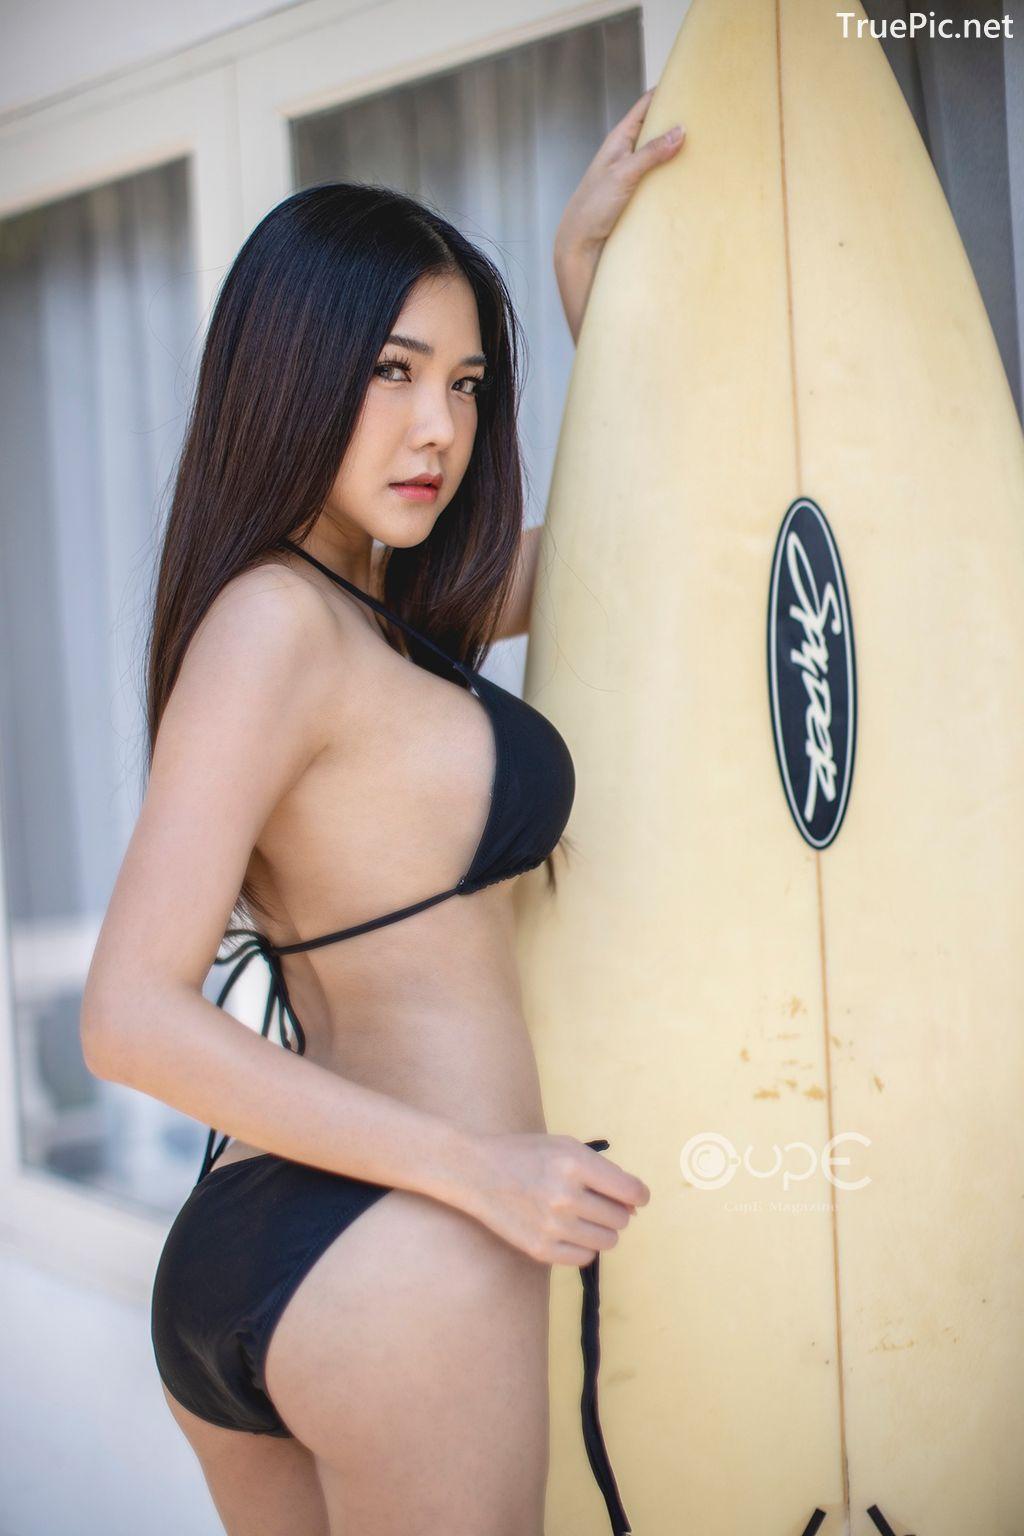 Image-Thailand-Model-Phitchamol-Srijantanet-Black-Bikini-TruePic.net- Picture-9